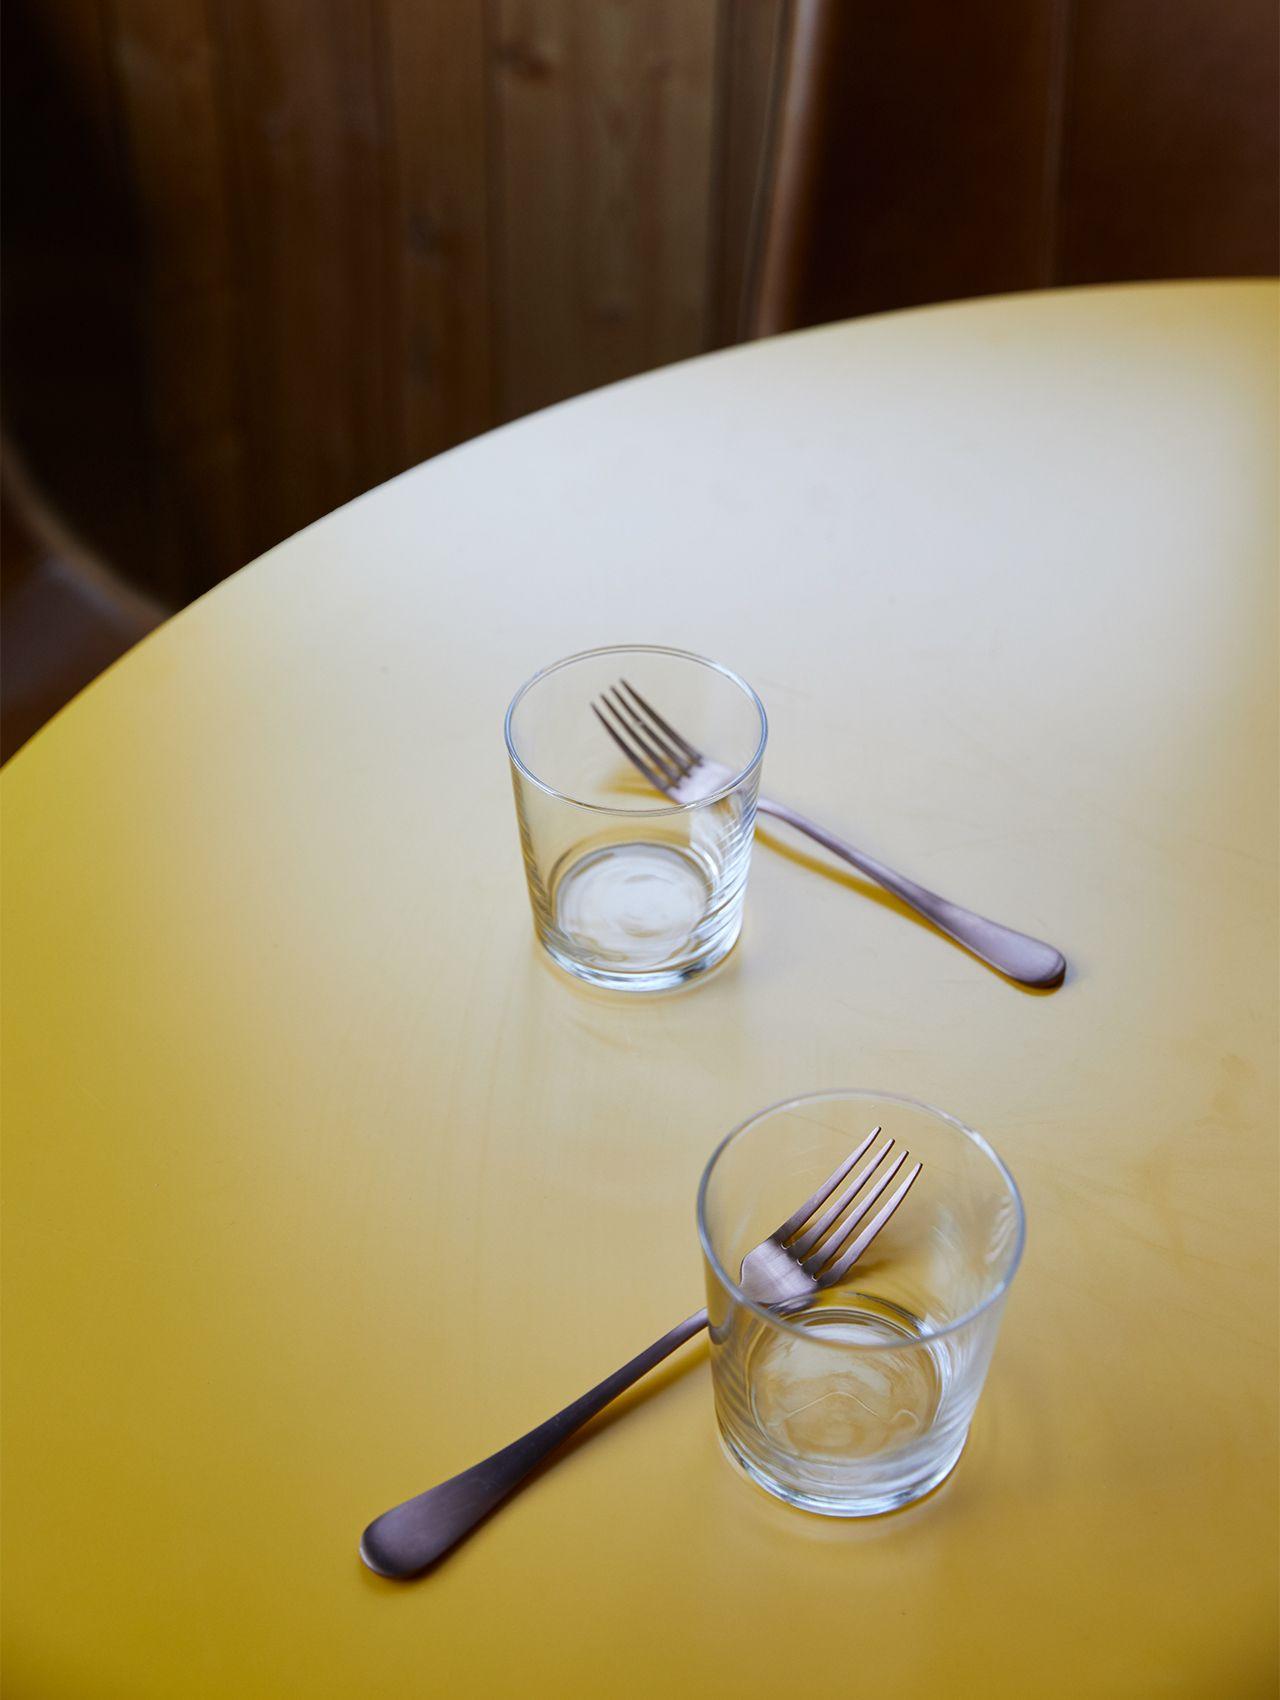 Glasses and Forks